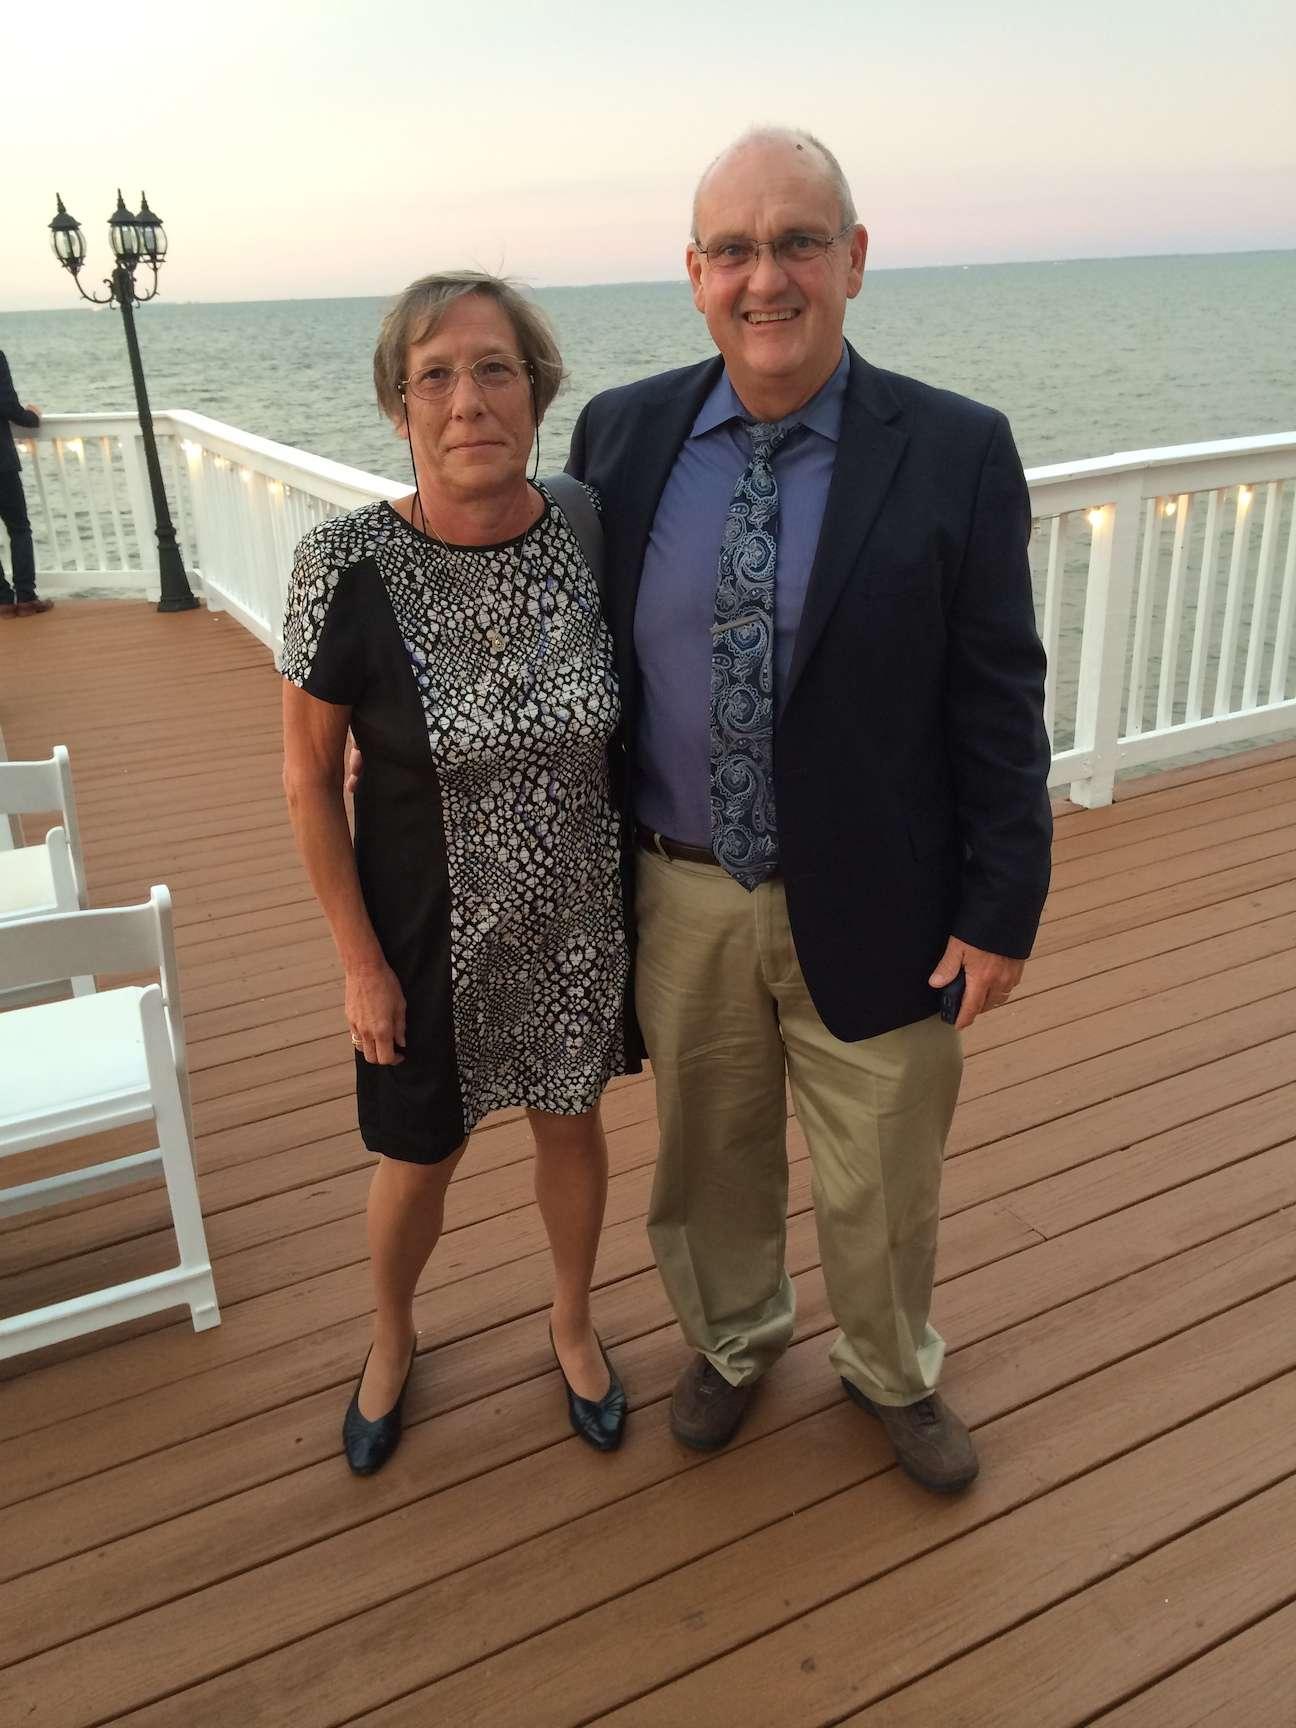 Lynn Garris and her husband